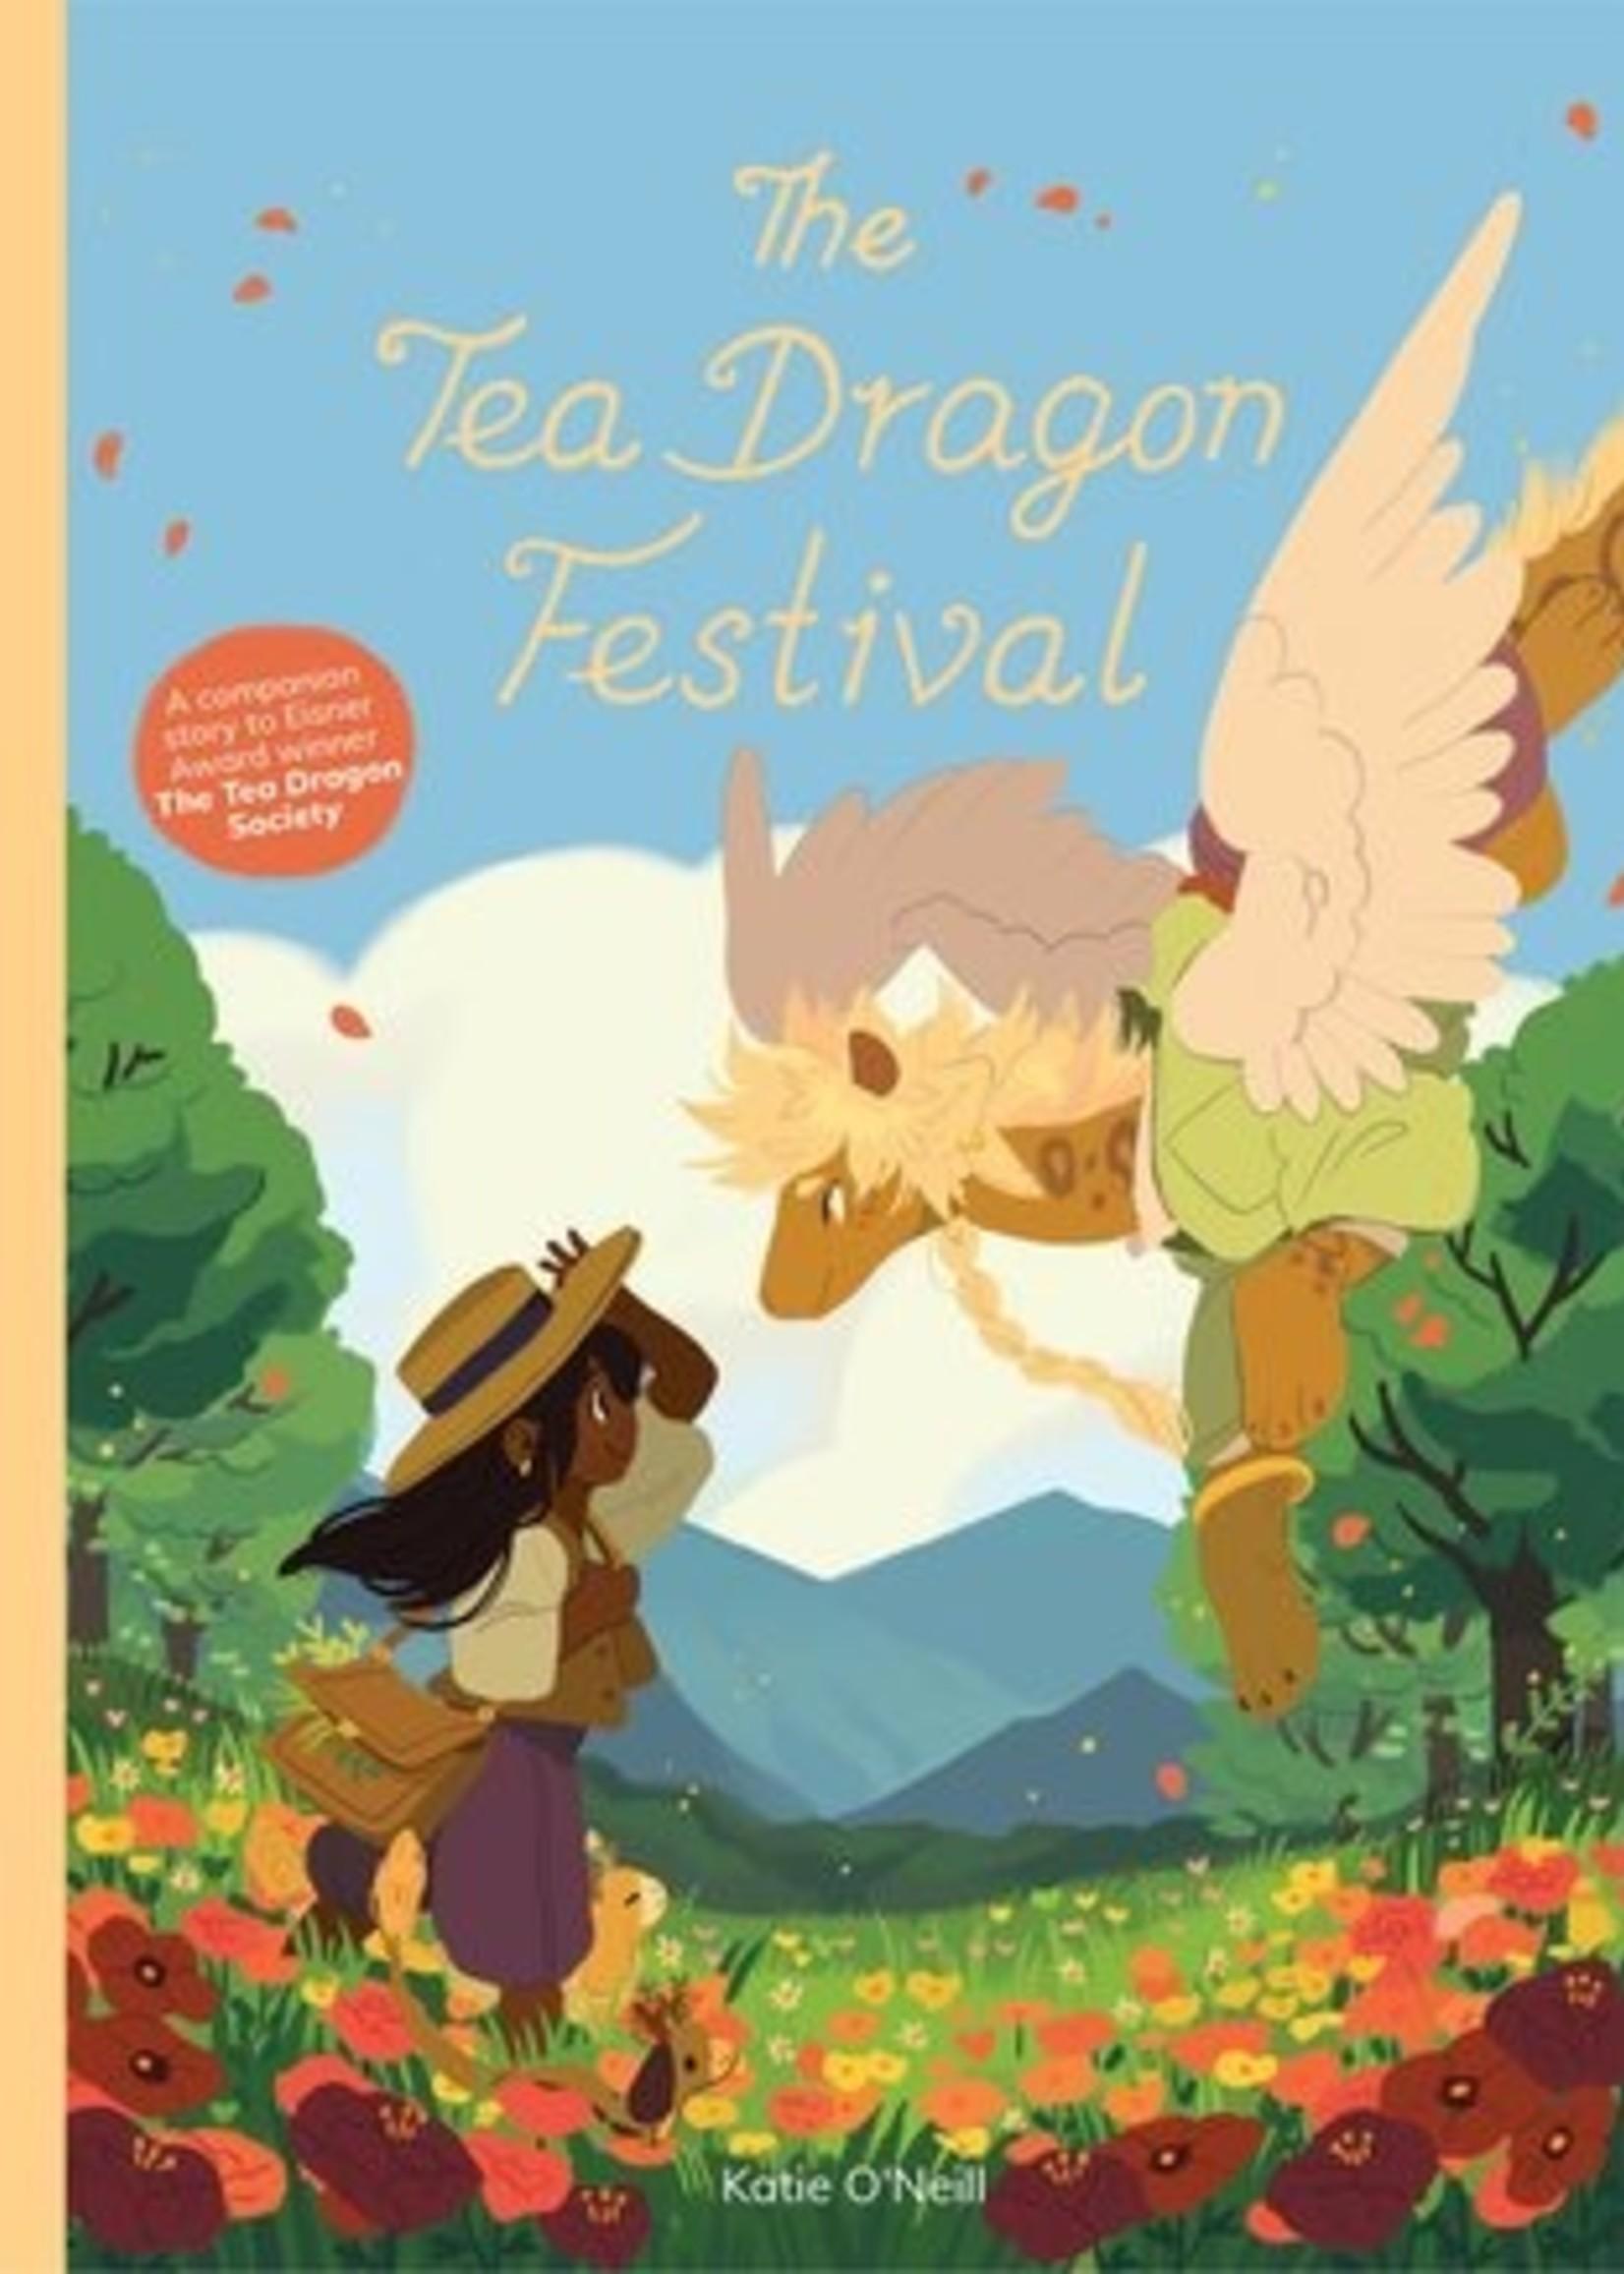 The Tea Dragon Society Graphic Novel #02, The Tea Dragon Festival - Paperback